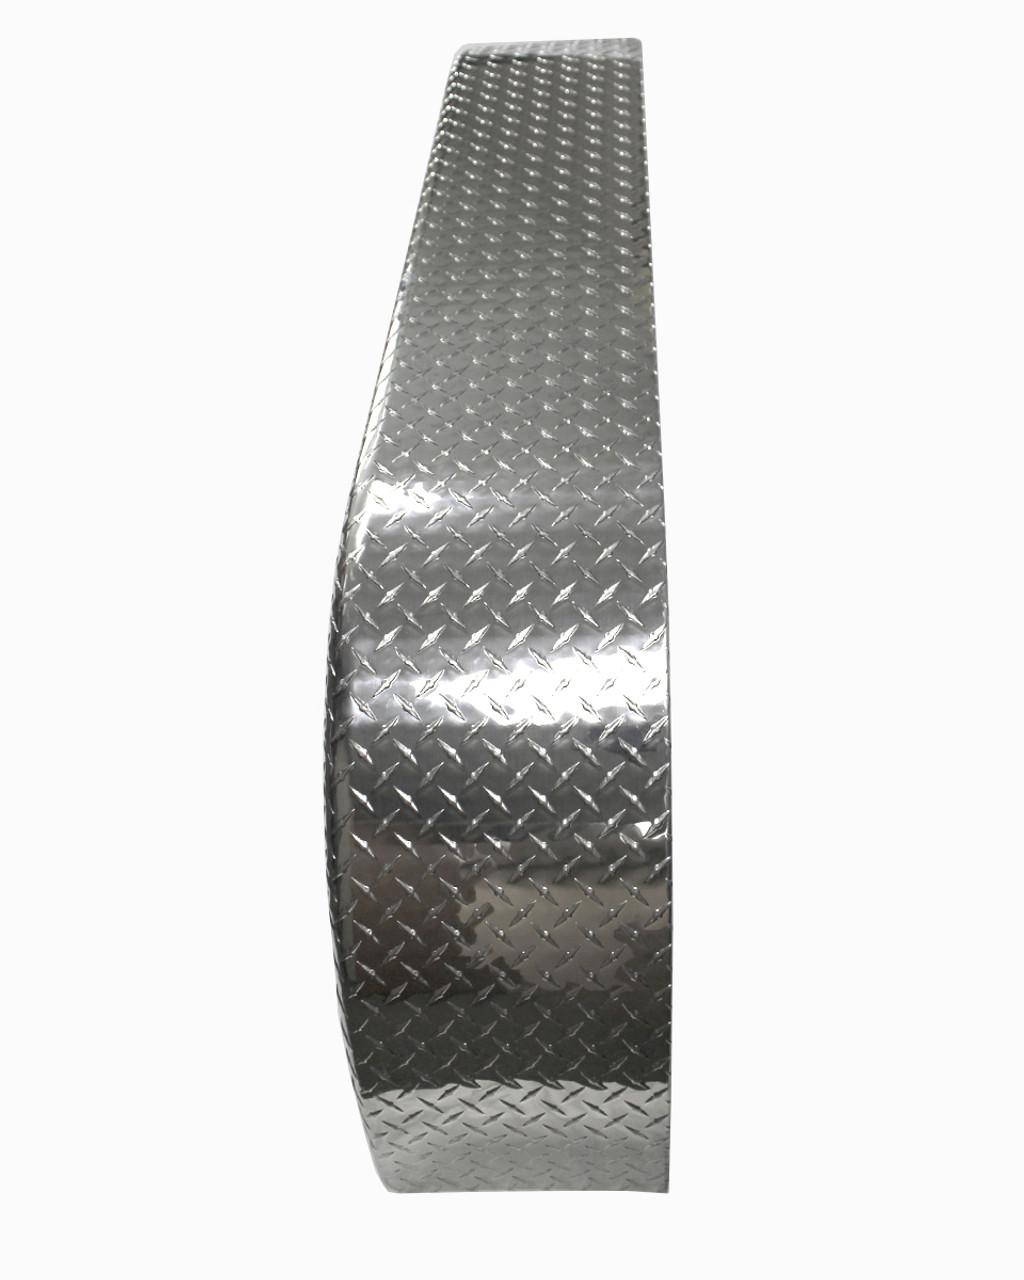 72x10-3/4 Tandem Axle Aluminum Tread Plate Trailer Fender top view